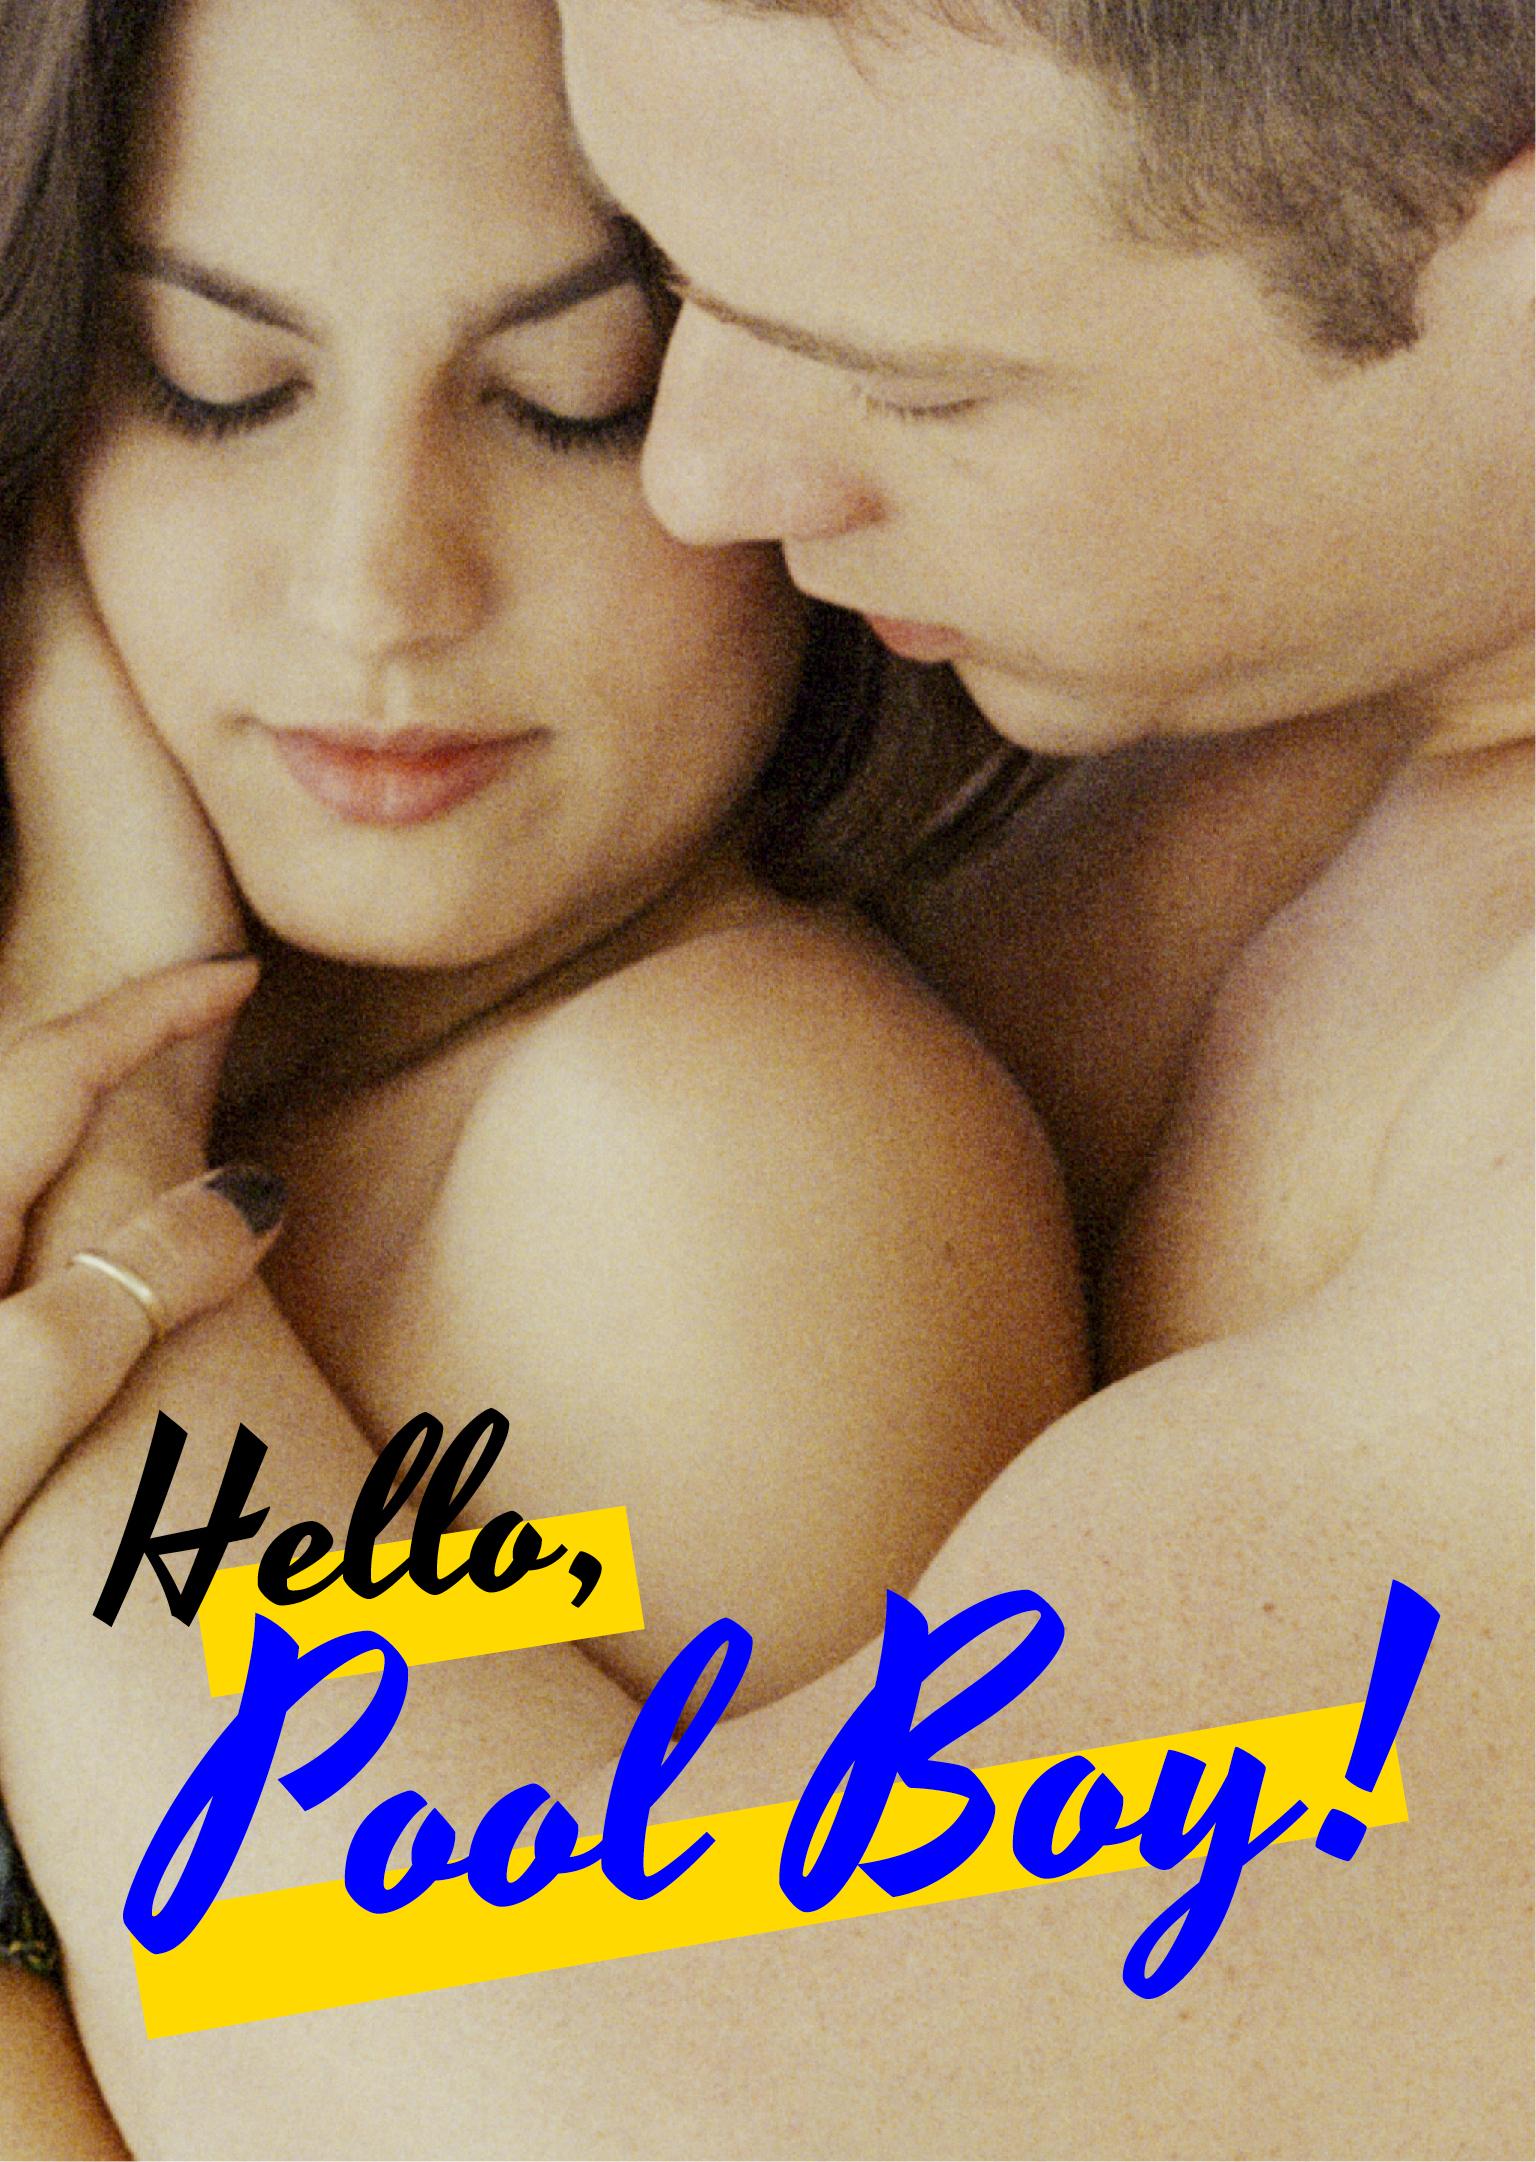 Xconfessions By Erika Lust, Hello, Pool Boy